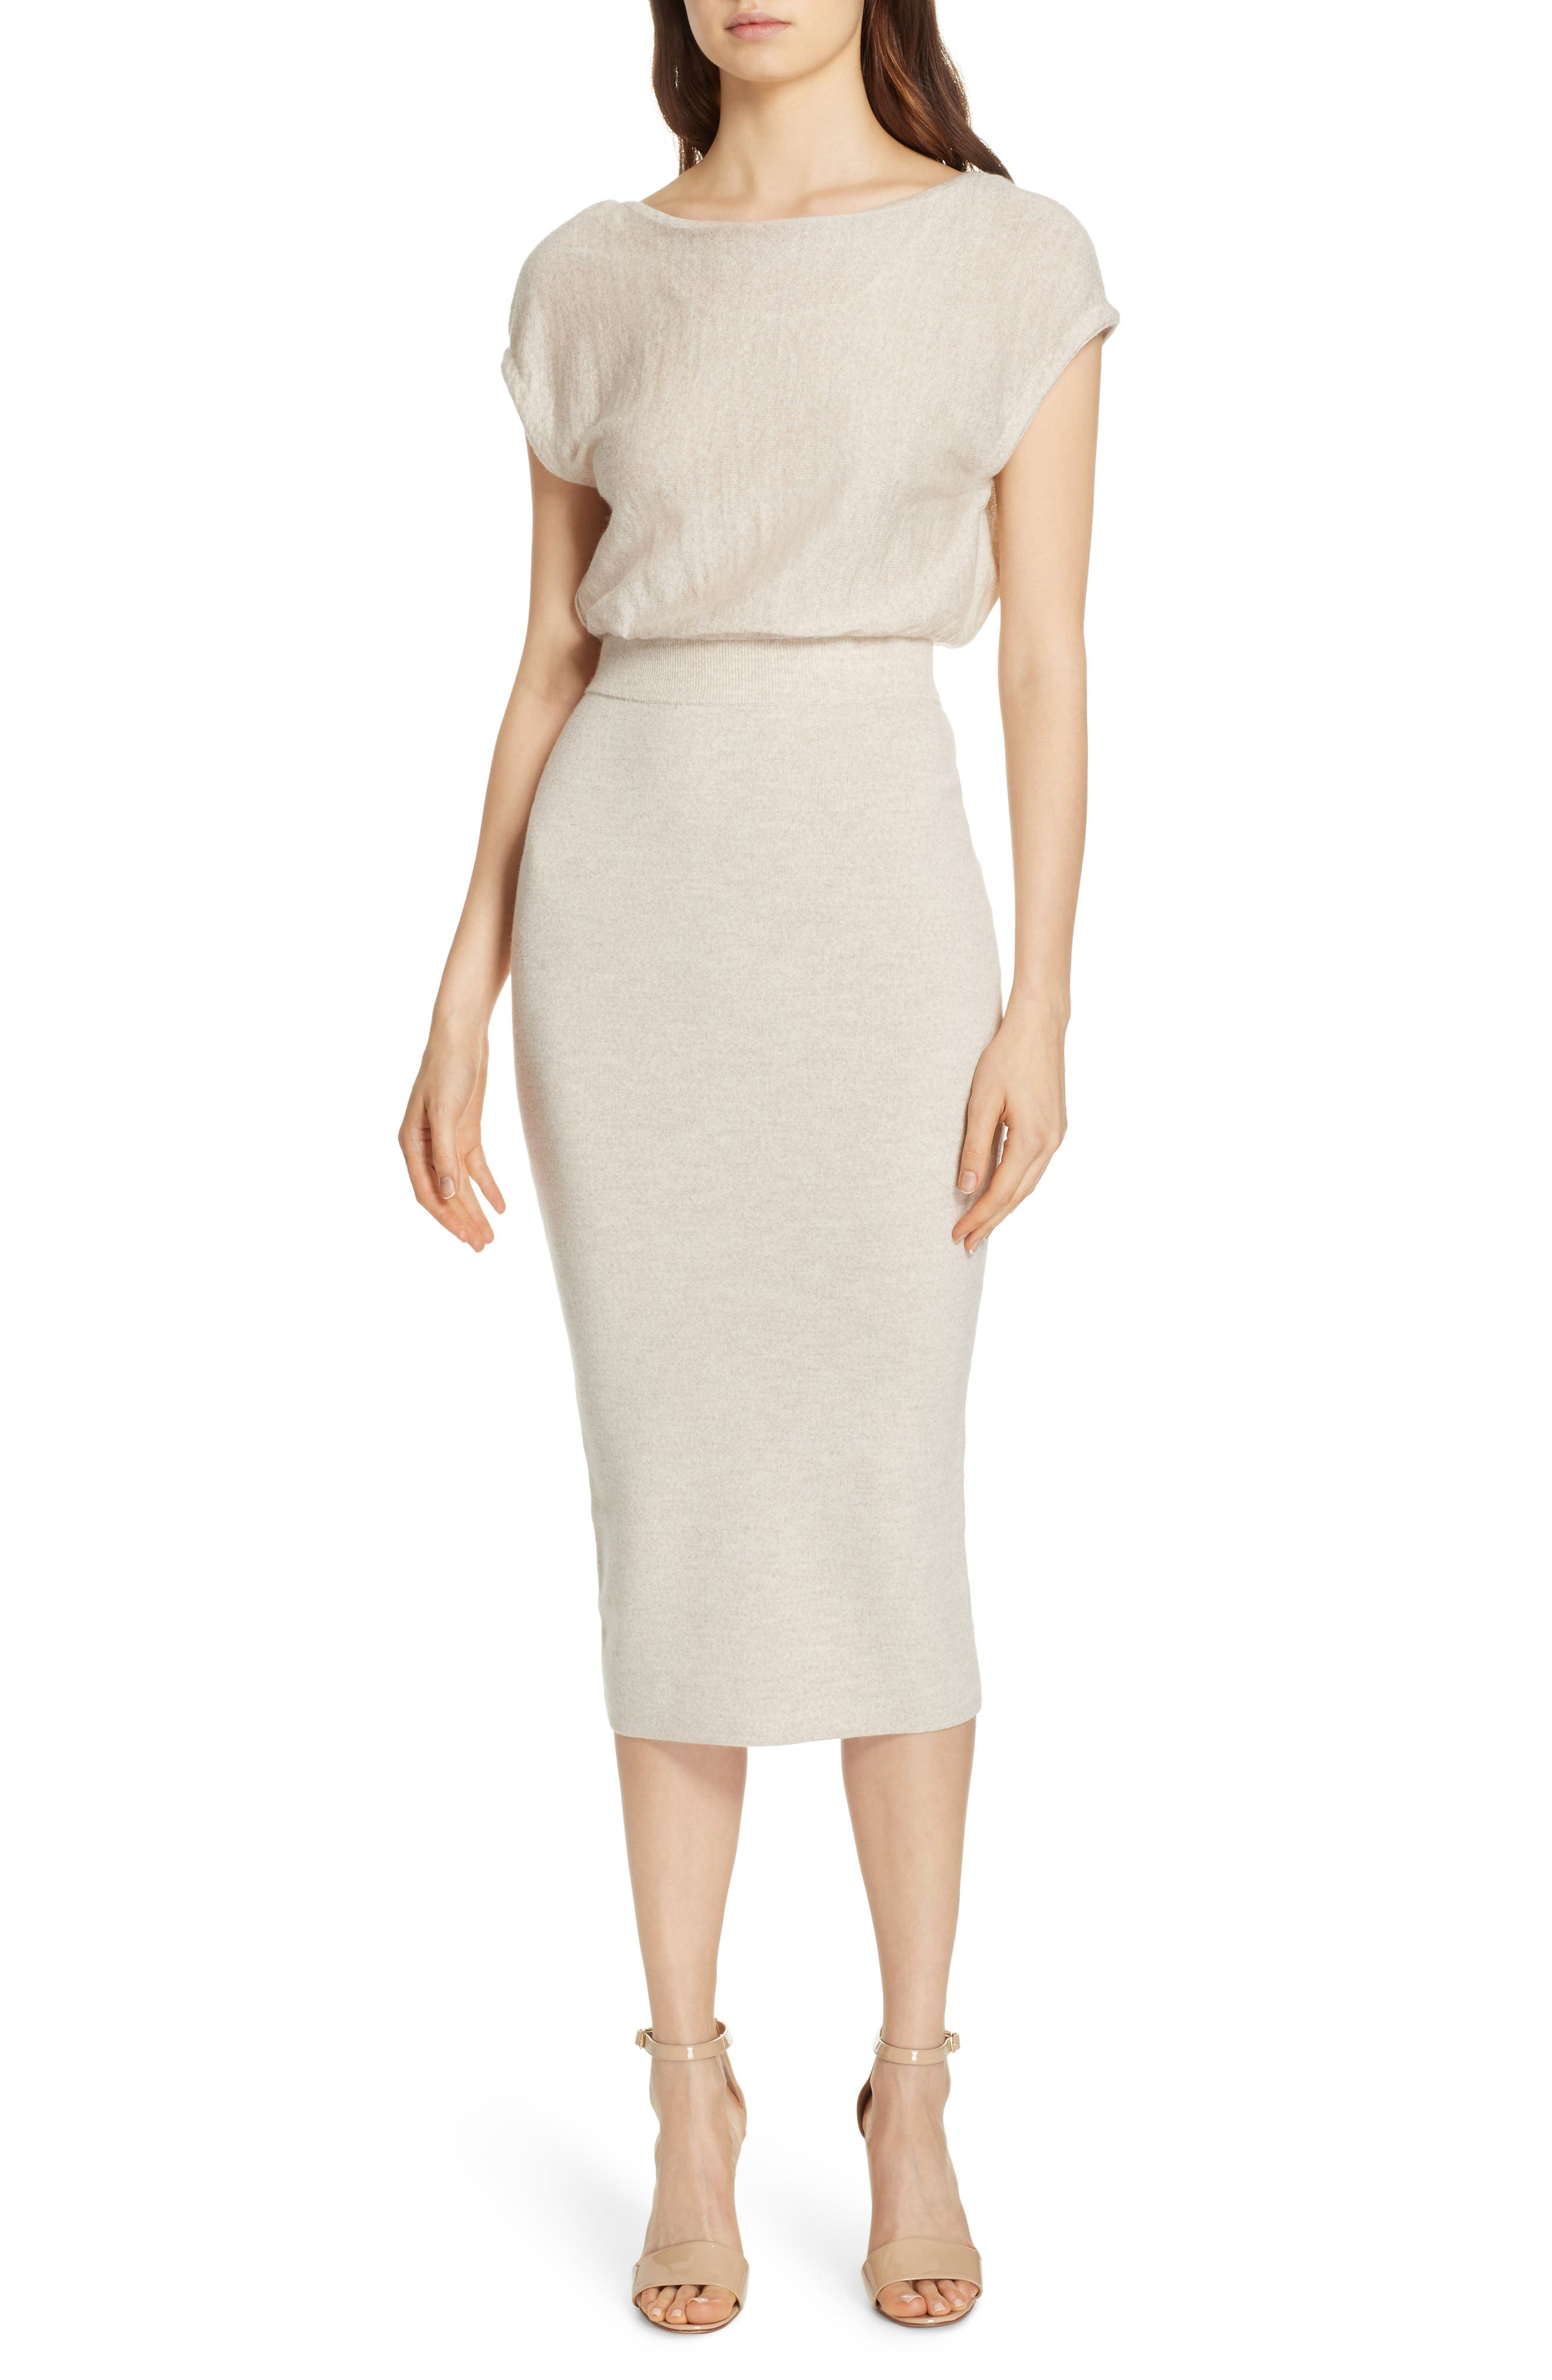 Alice + Olivia Shara Twist Back Blouson Dress, Ivory